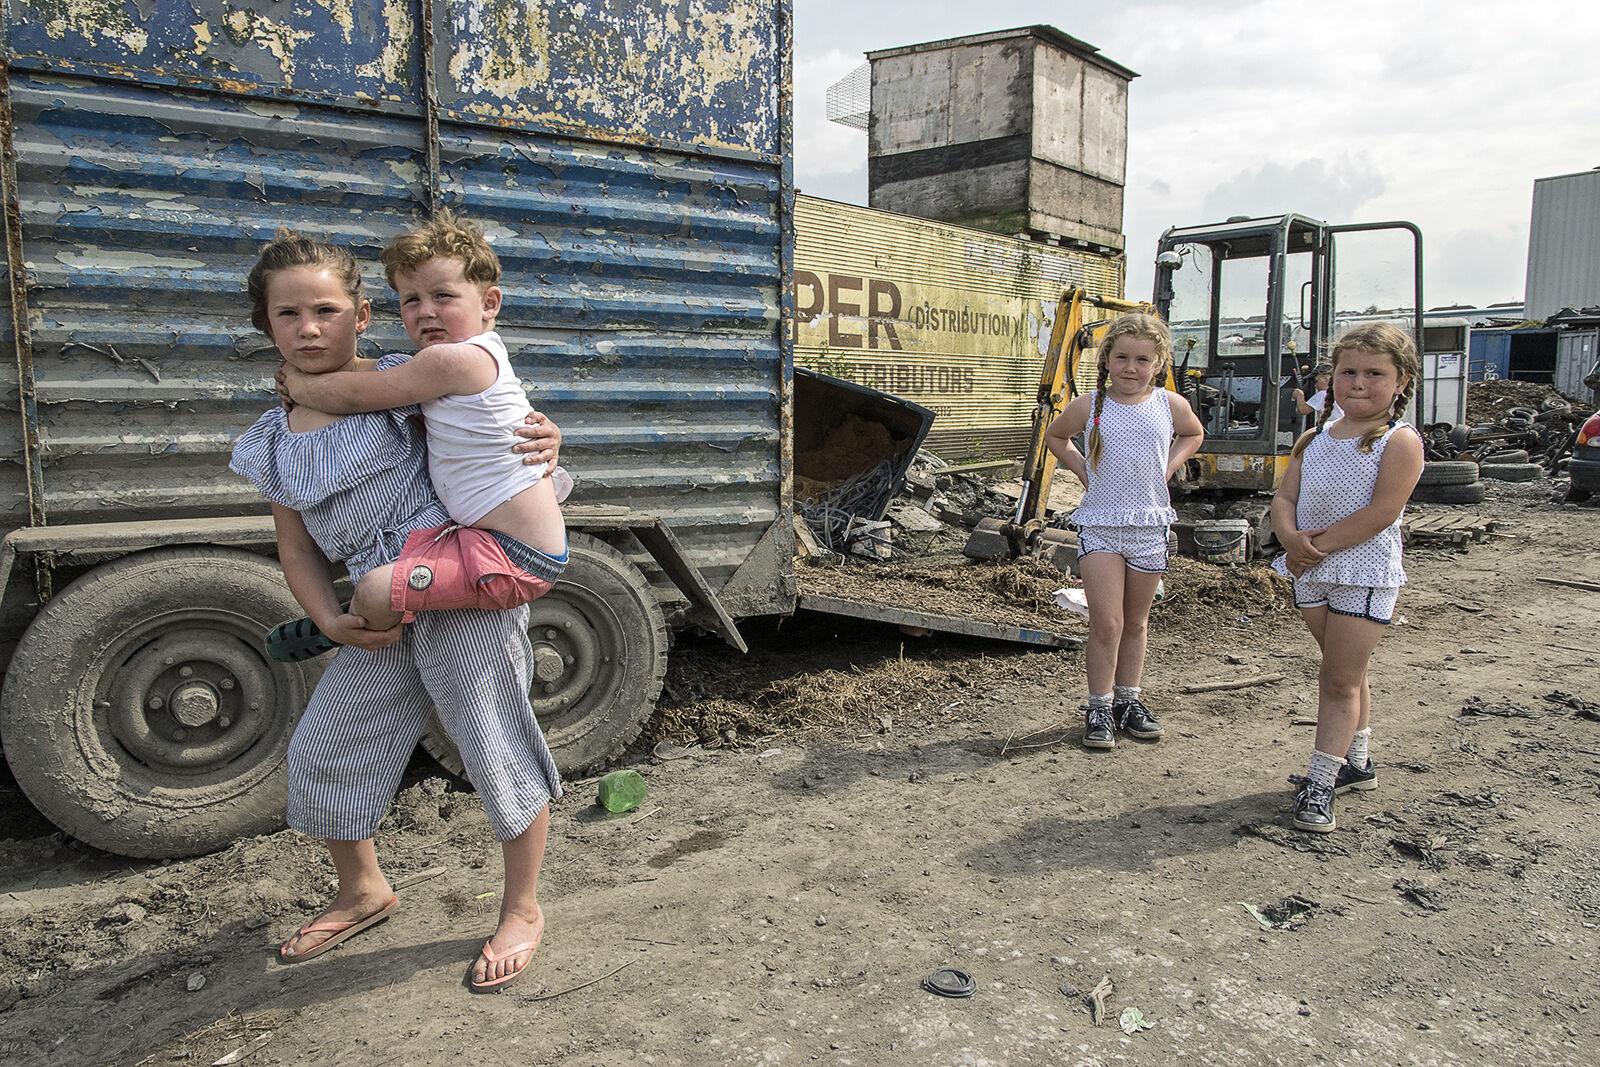 Donoghue Kids in Scrapyard, Limerick, Ireland 2019